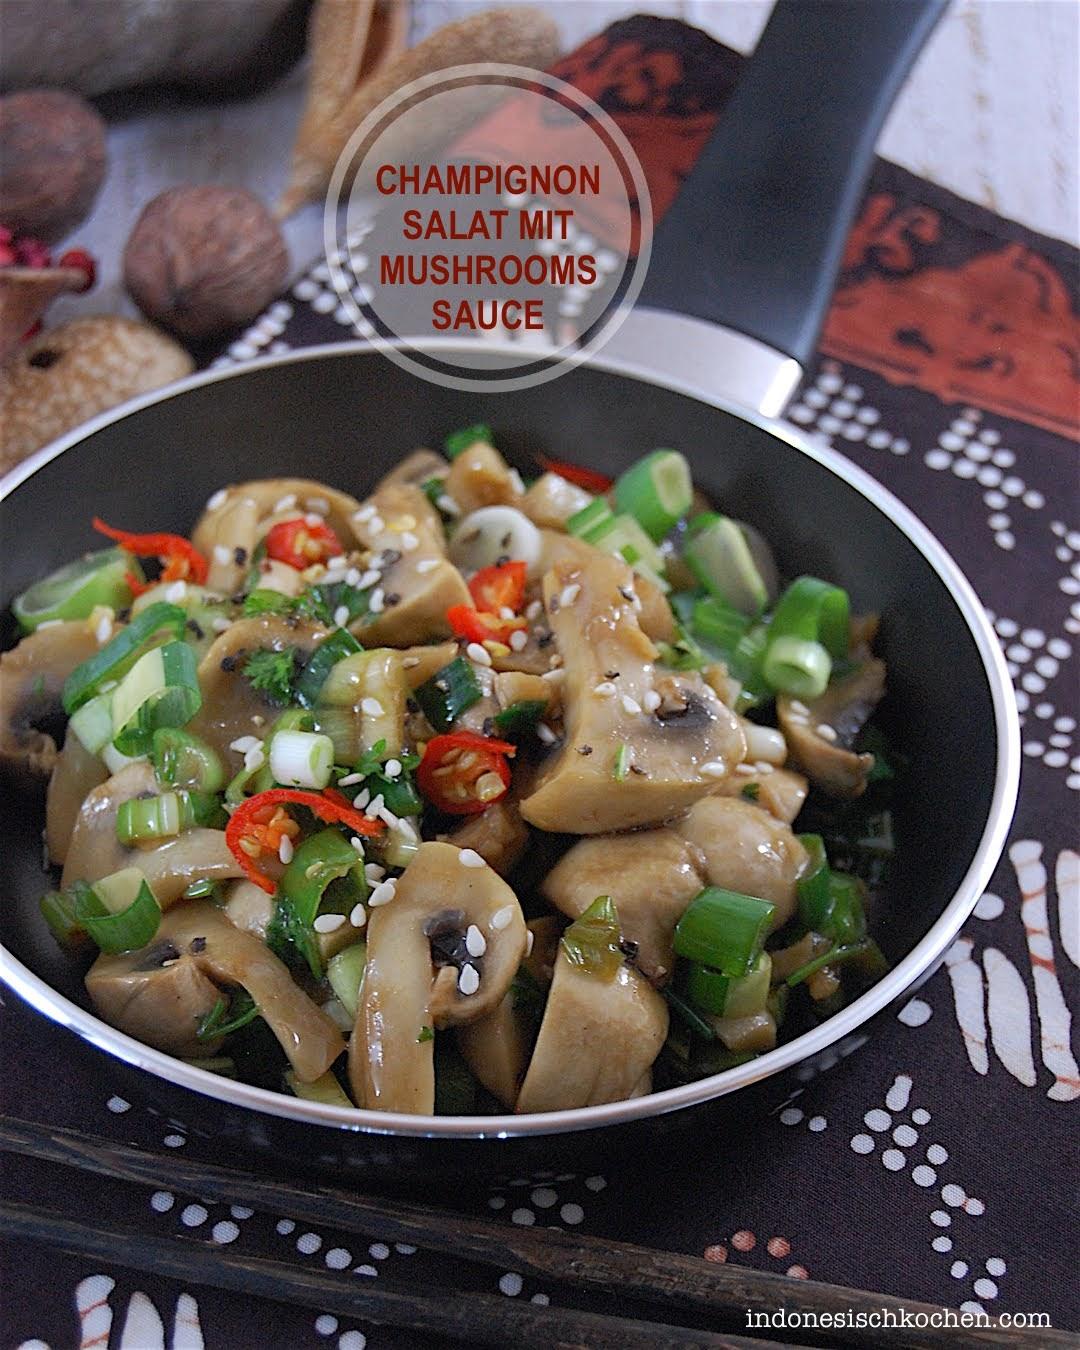 Veganer Champignonsalat mit Mushrooms Sauce